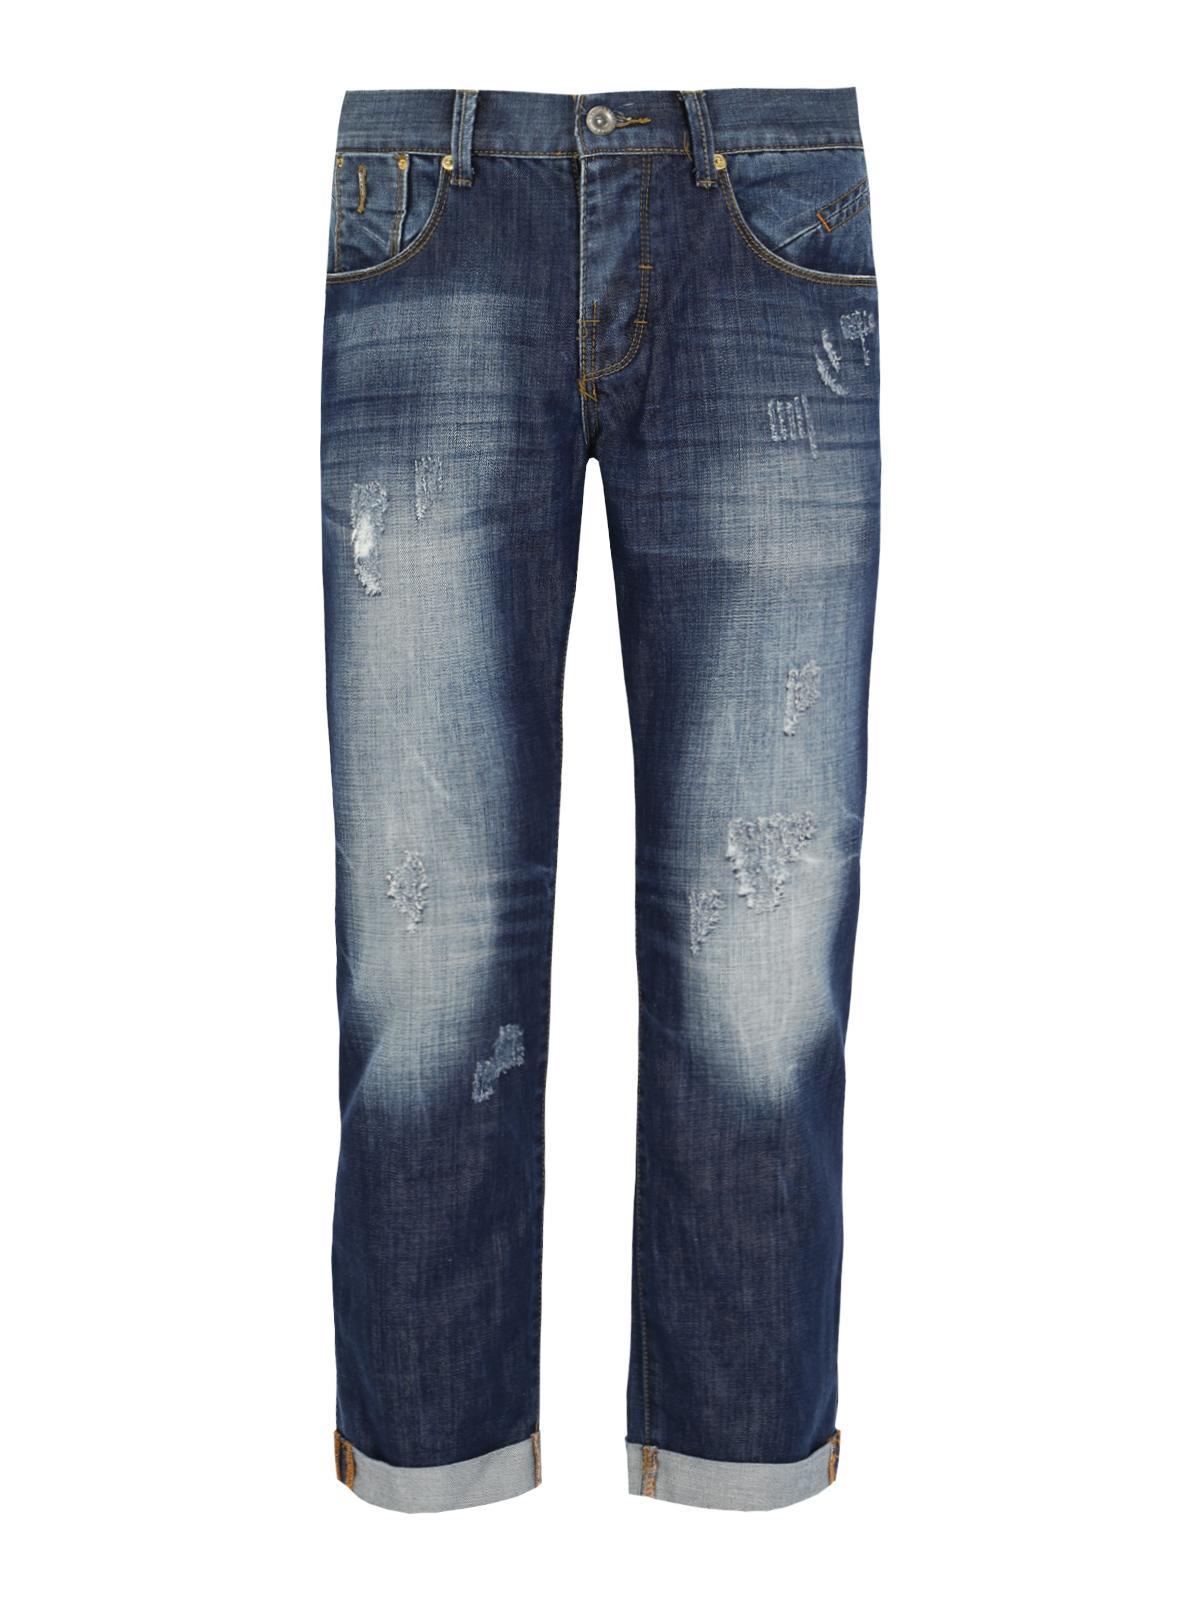 8d2573264b Jeans Effetto Consumato marshall angel | MecShopping